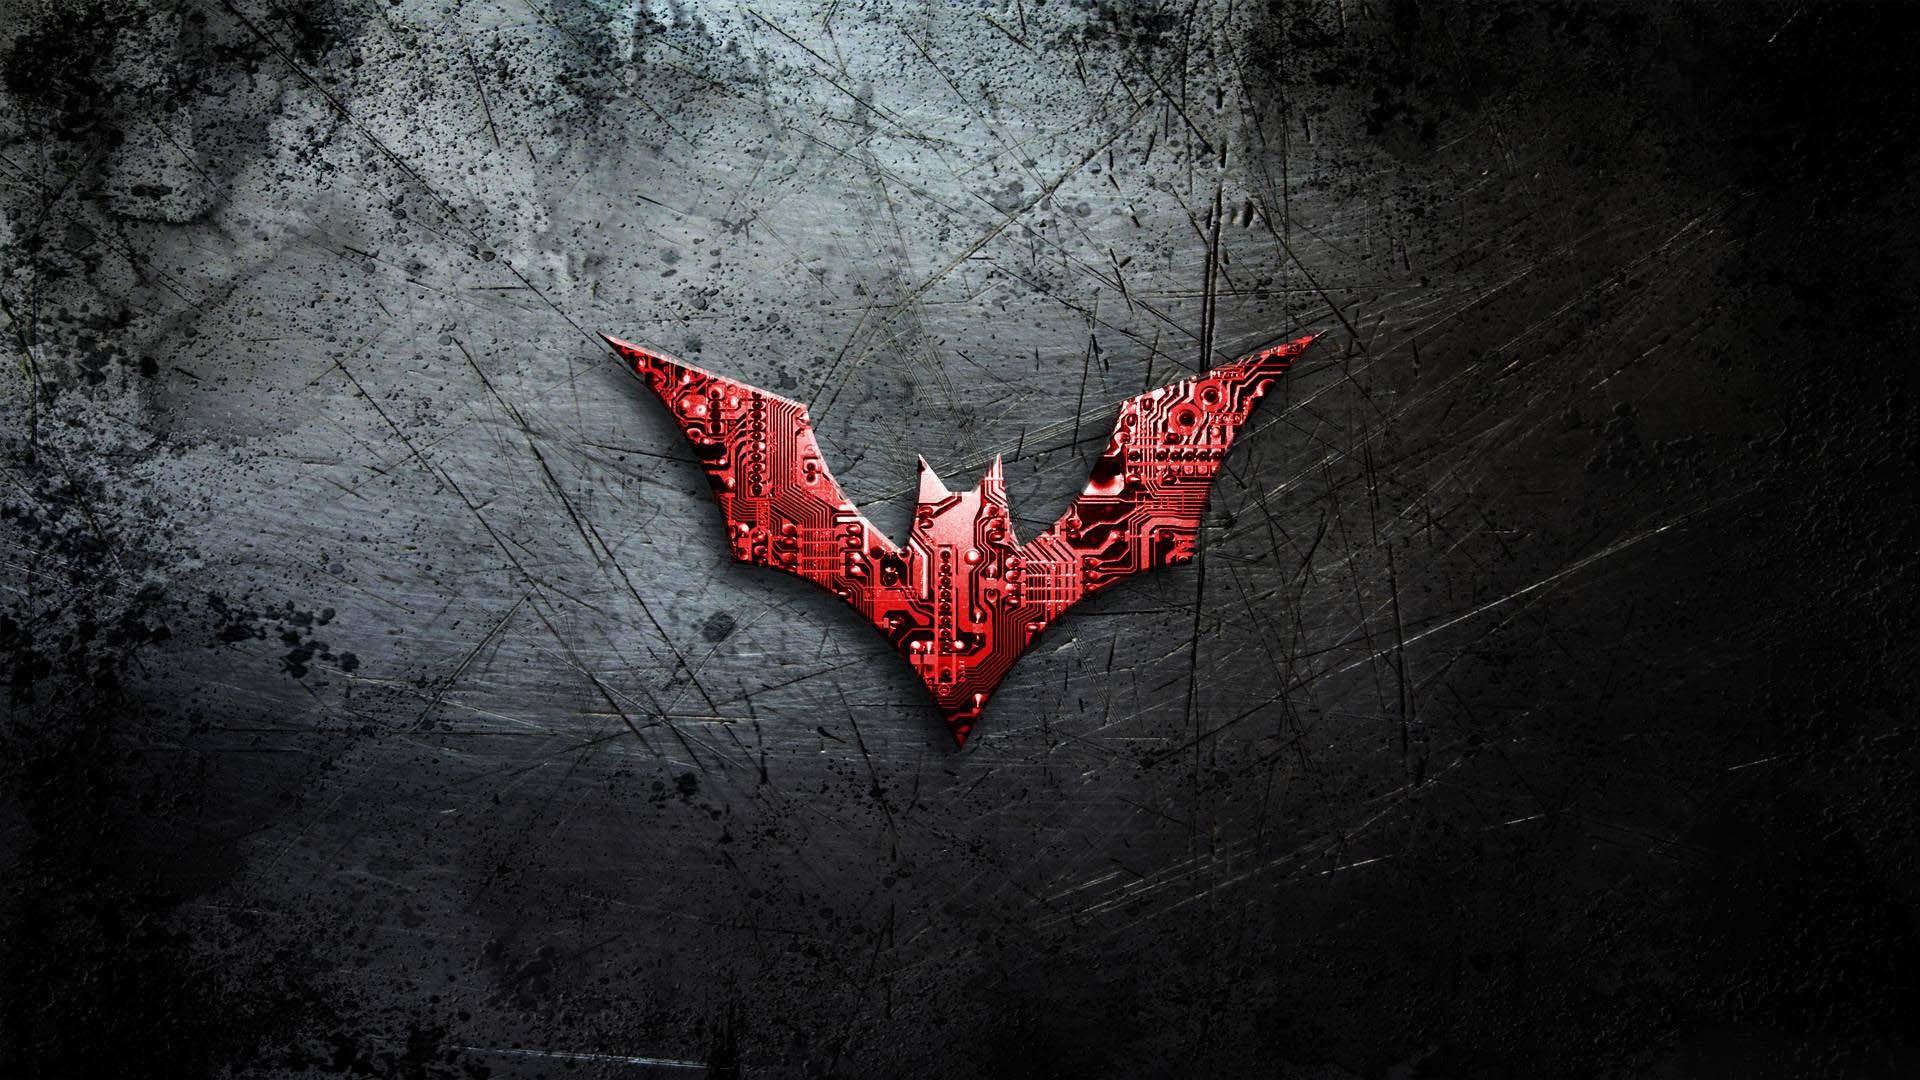 Batman Beyond Hd Wallpaper 81 Images